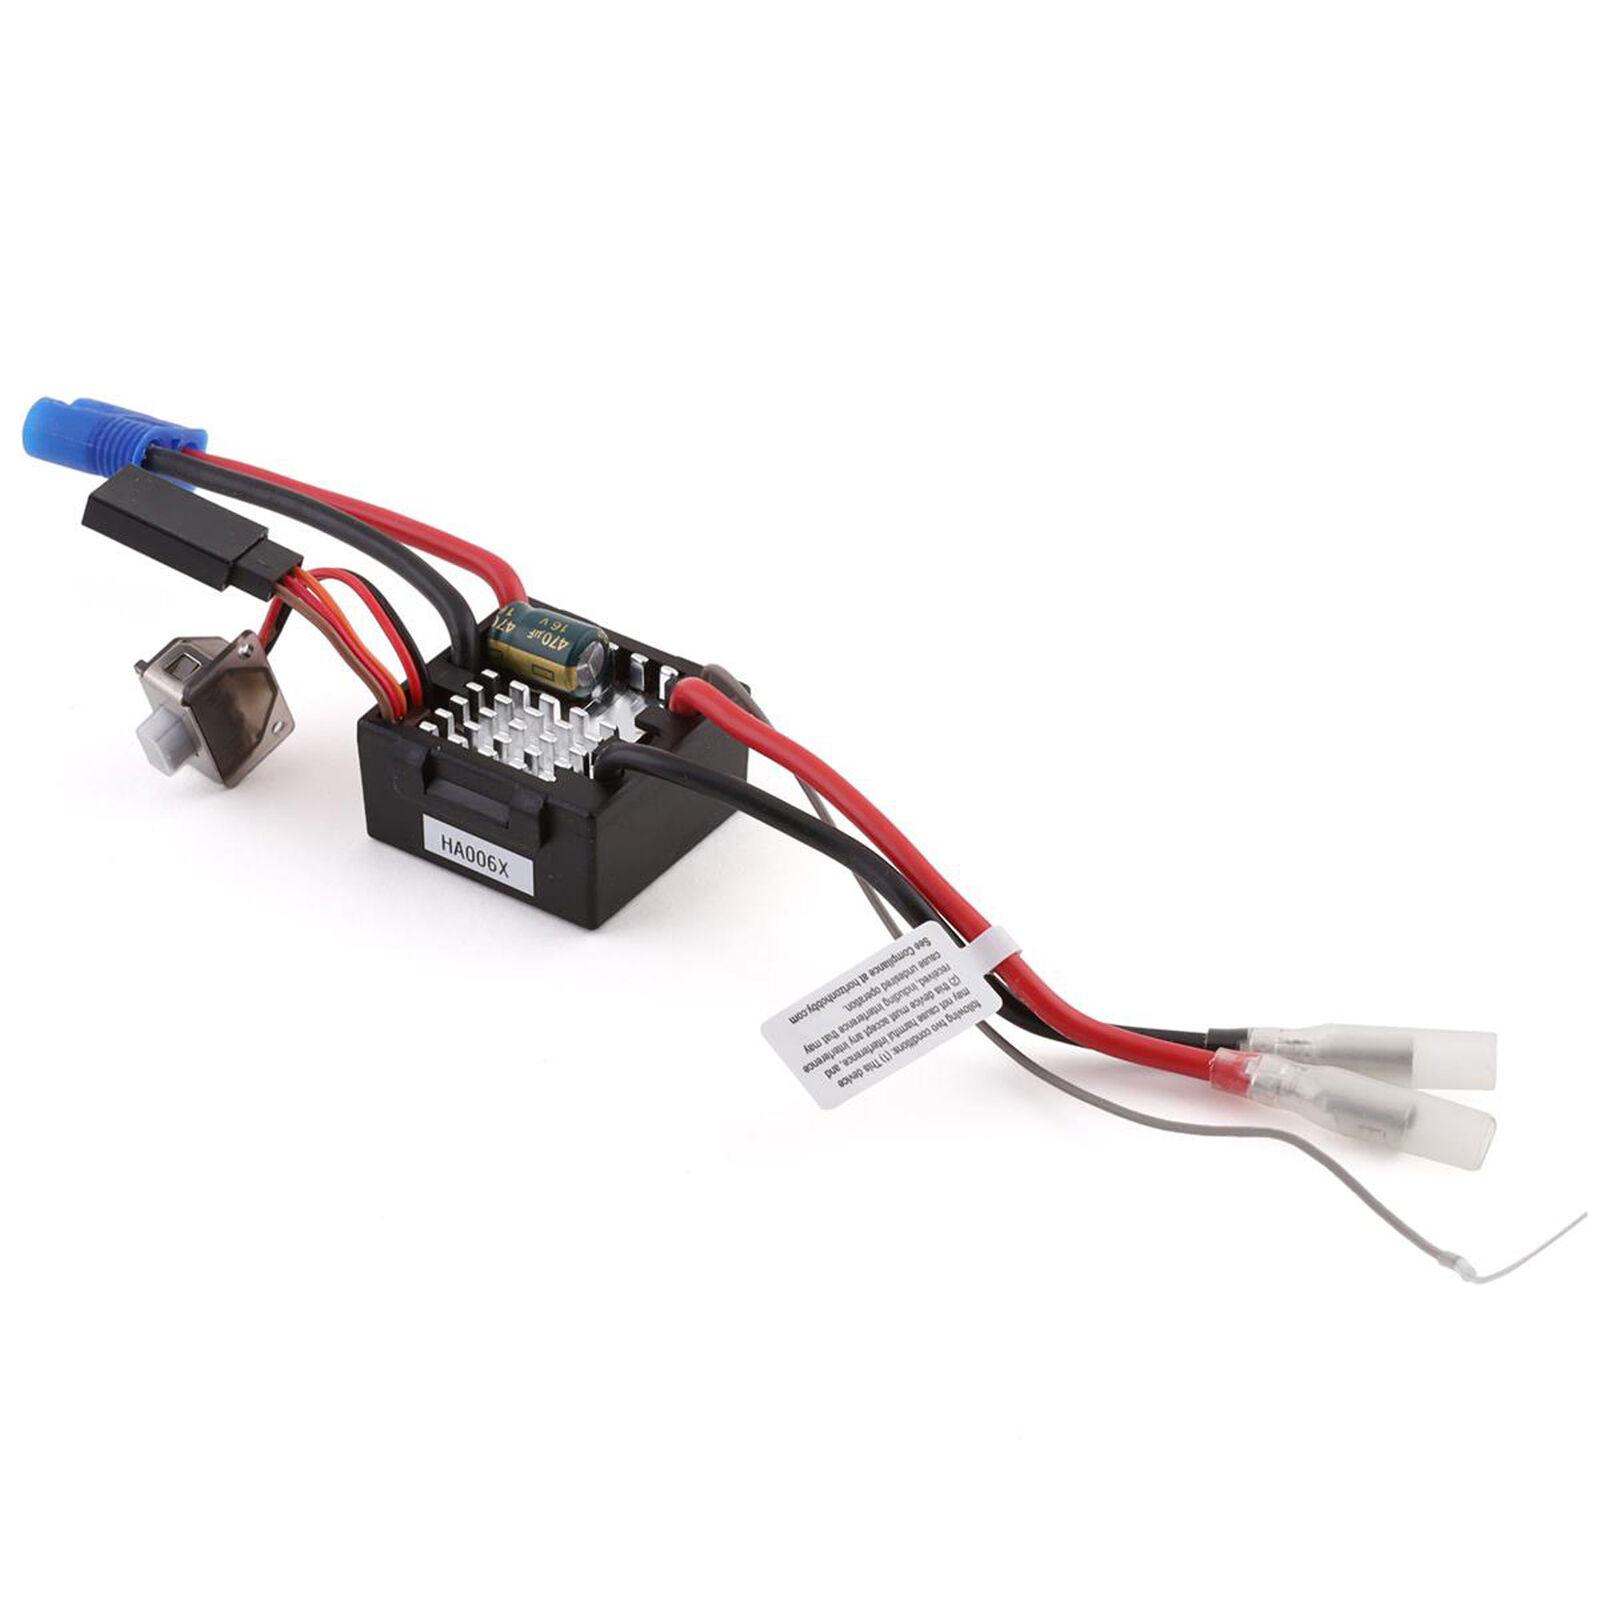 SRX220 FHSS 2-Channel Crawler Receiver and ESC